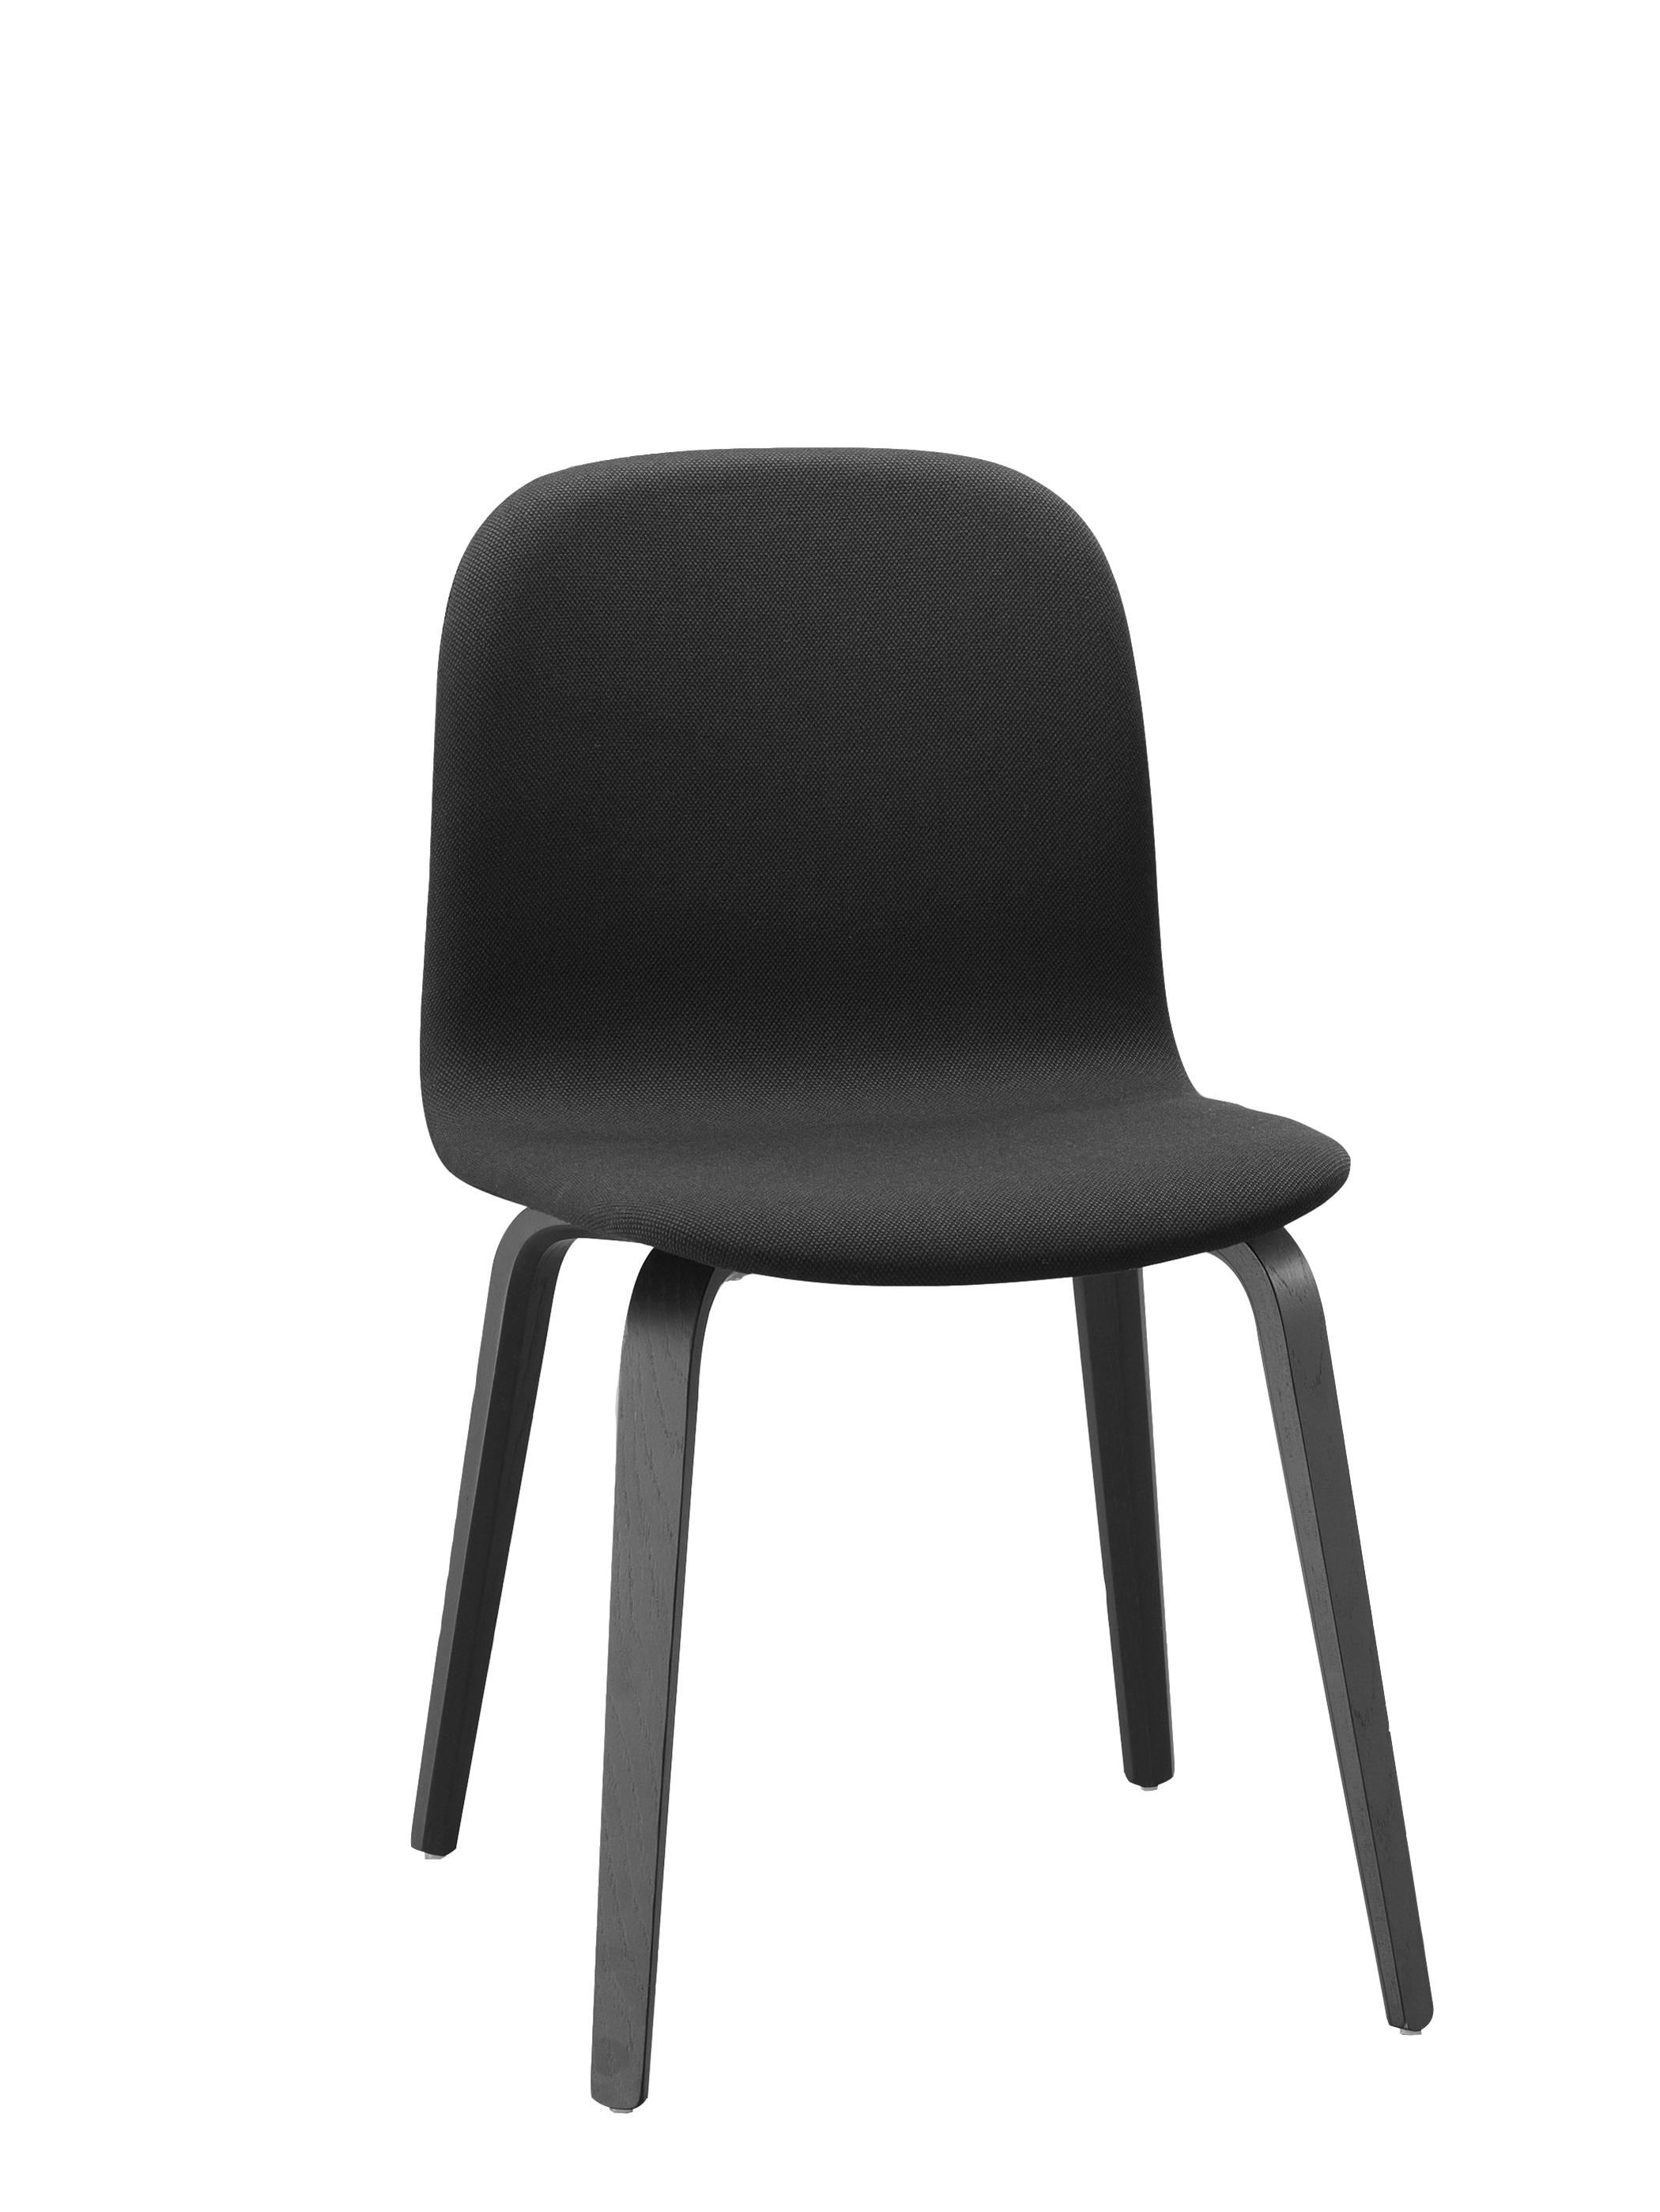 Muuto visu chair wood base holgestell gepolstert black for Schalenstuhl gepolstert